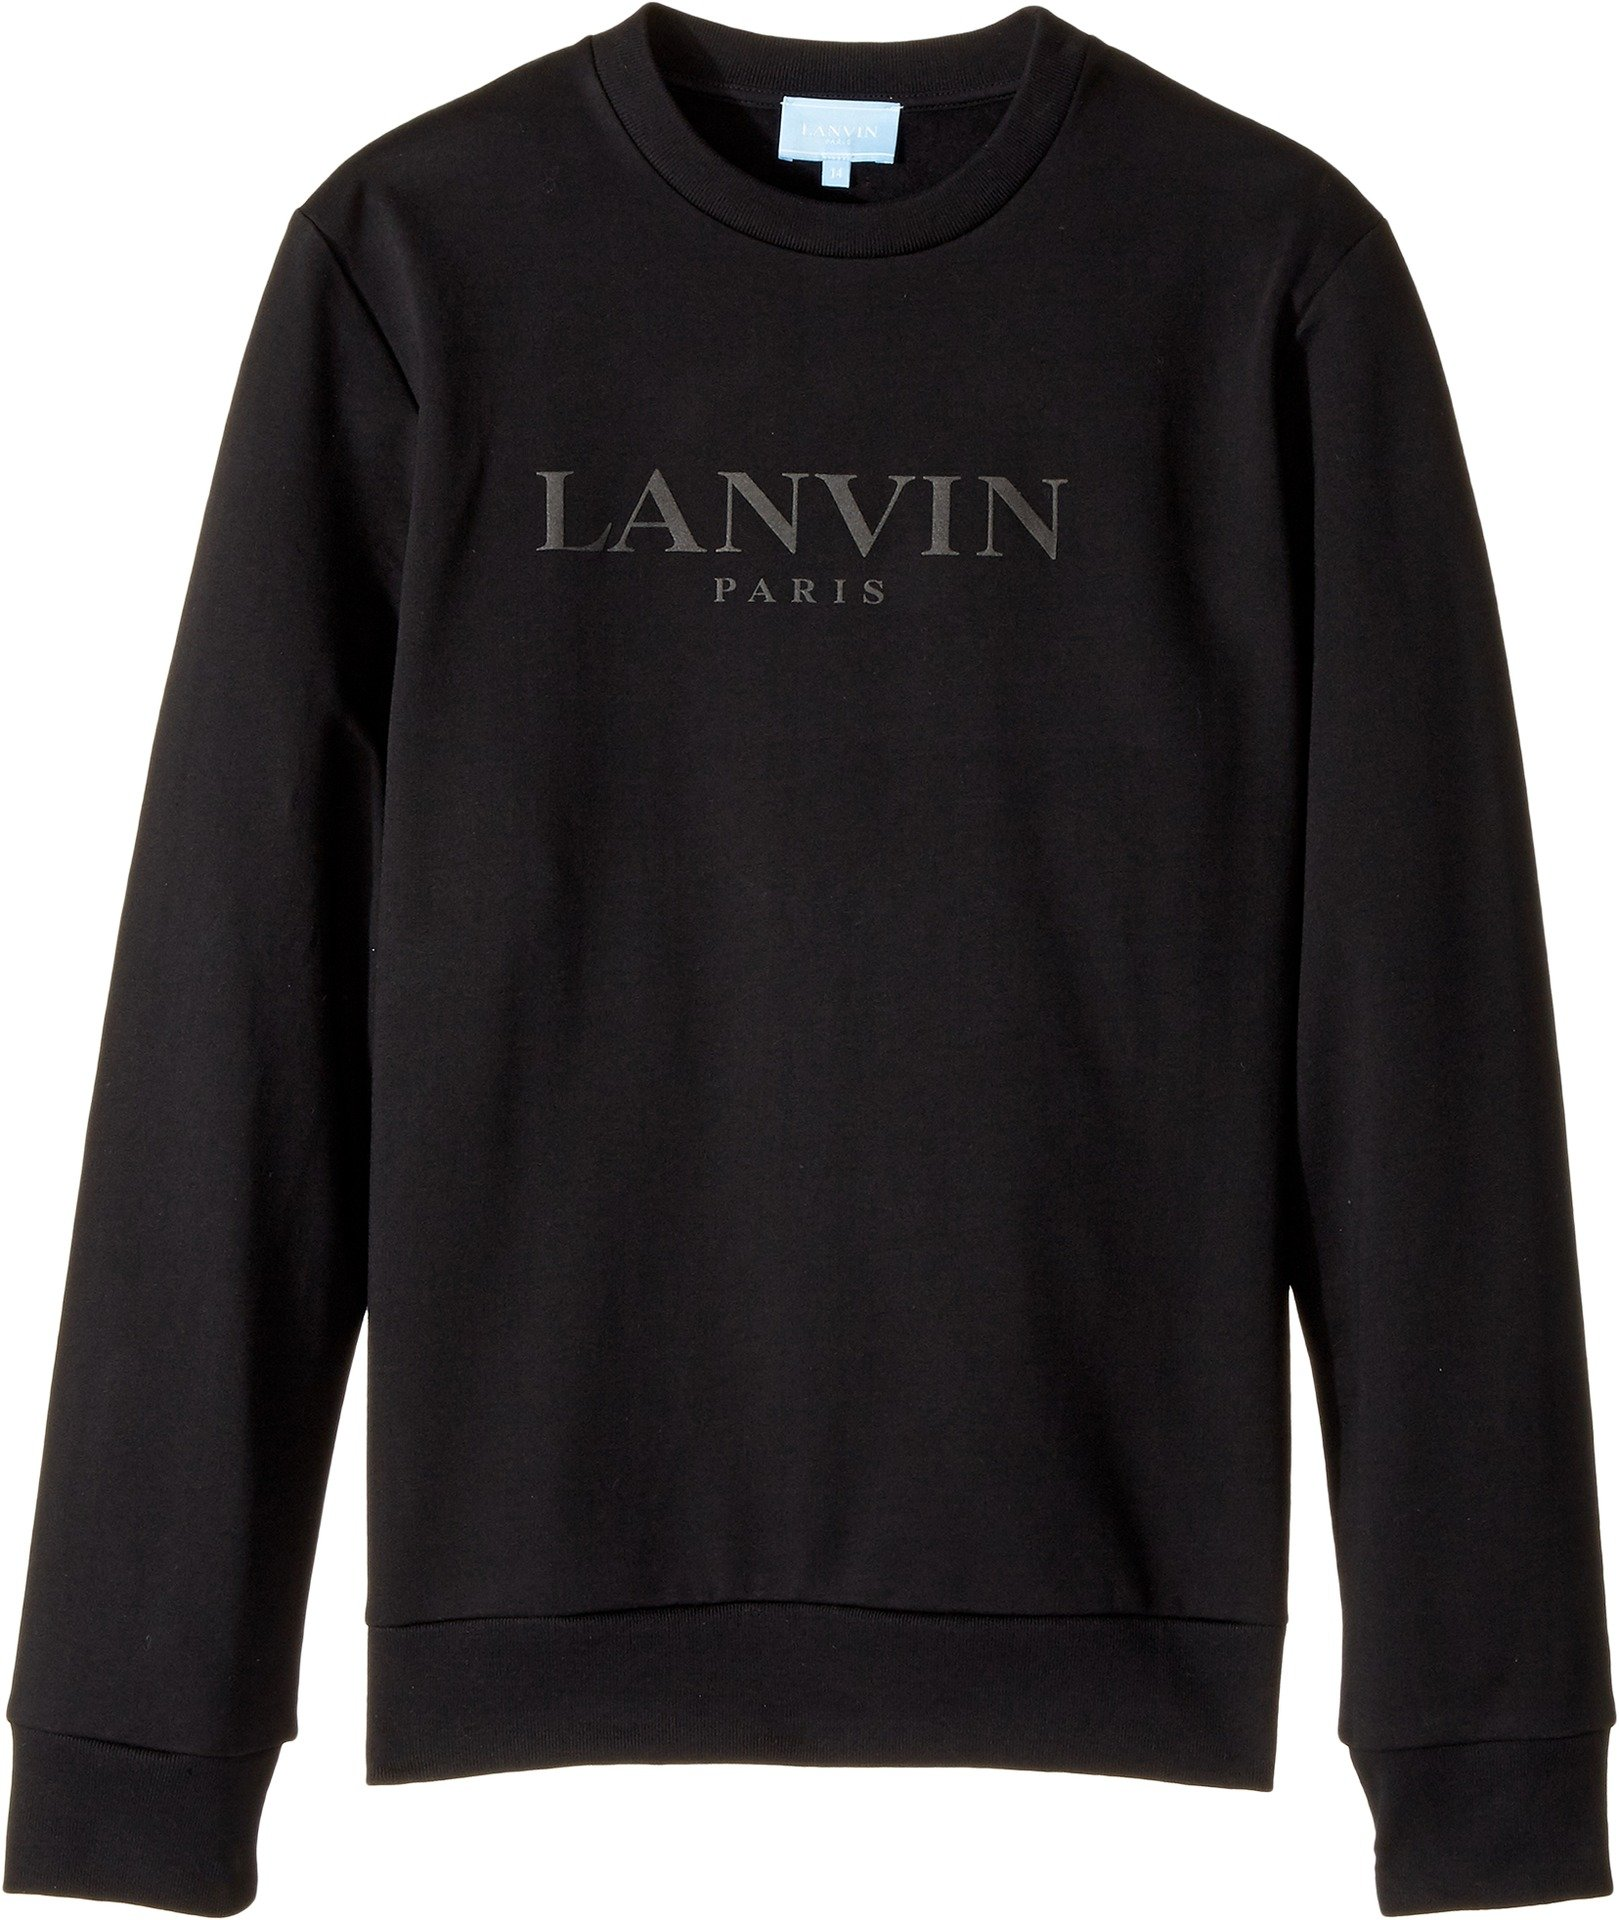 Lanvin Kids Unisex Long Sleeve Logo Sweat Top (Big Kids) Black 10  Years